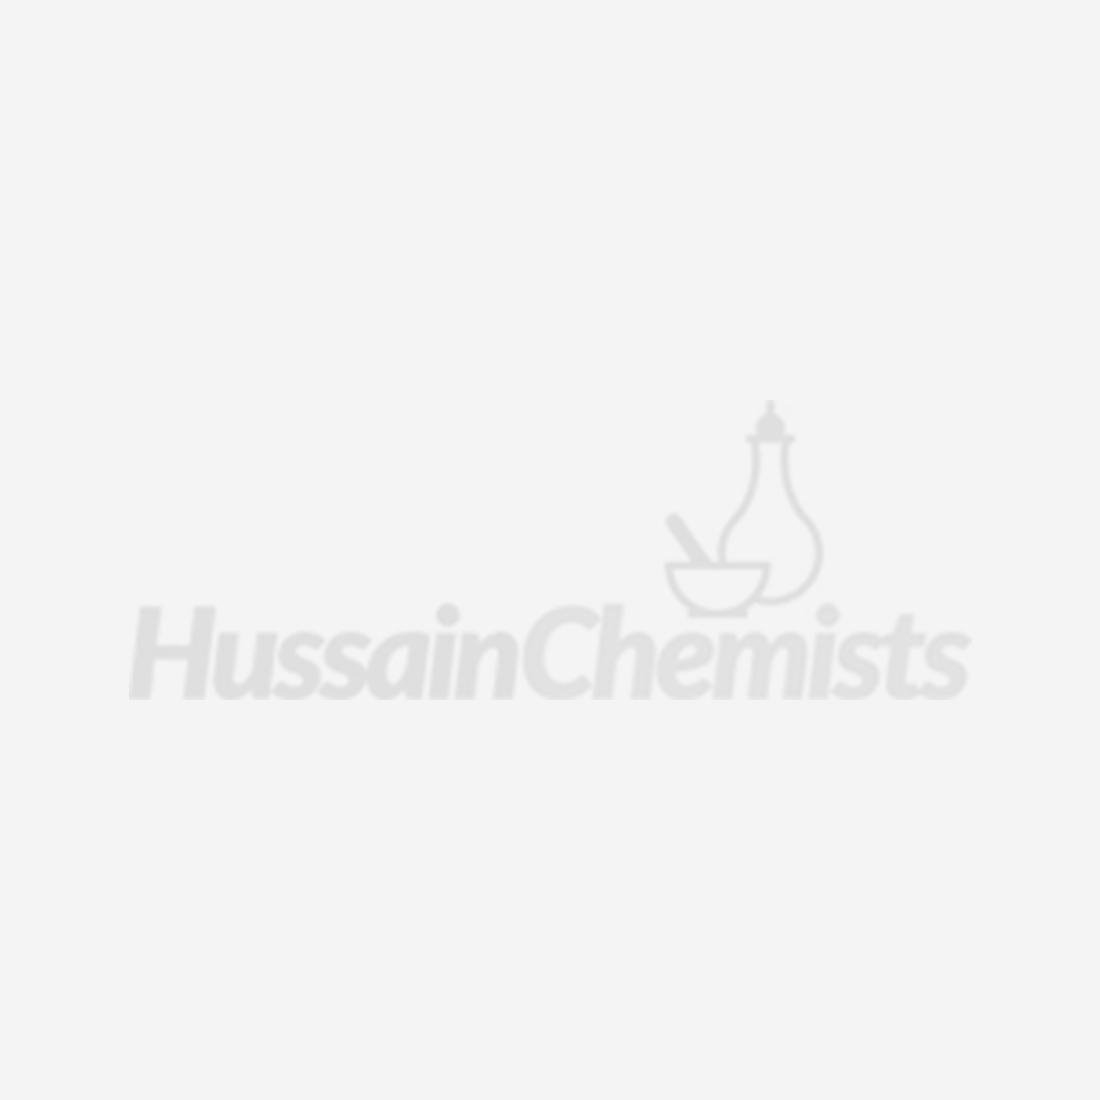 Care Citric Acid Monohydrate BP 50g